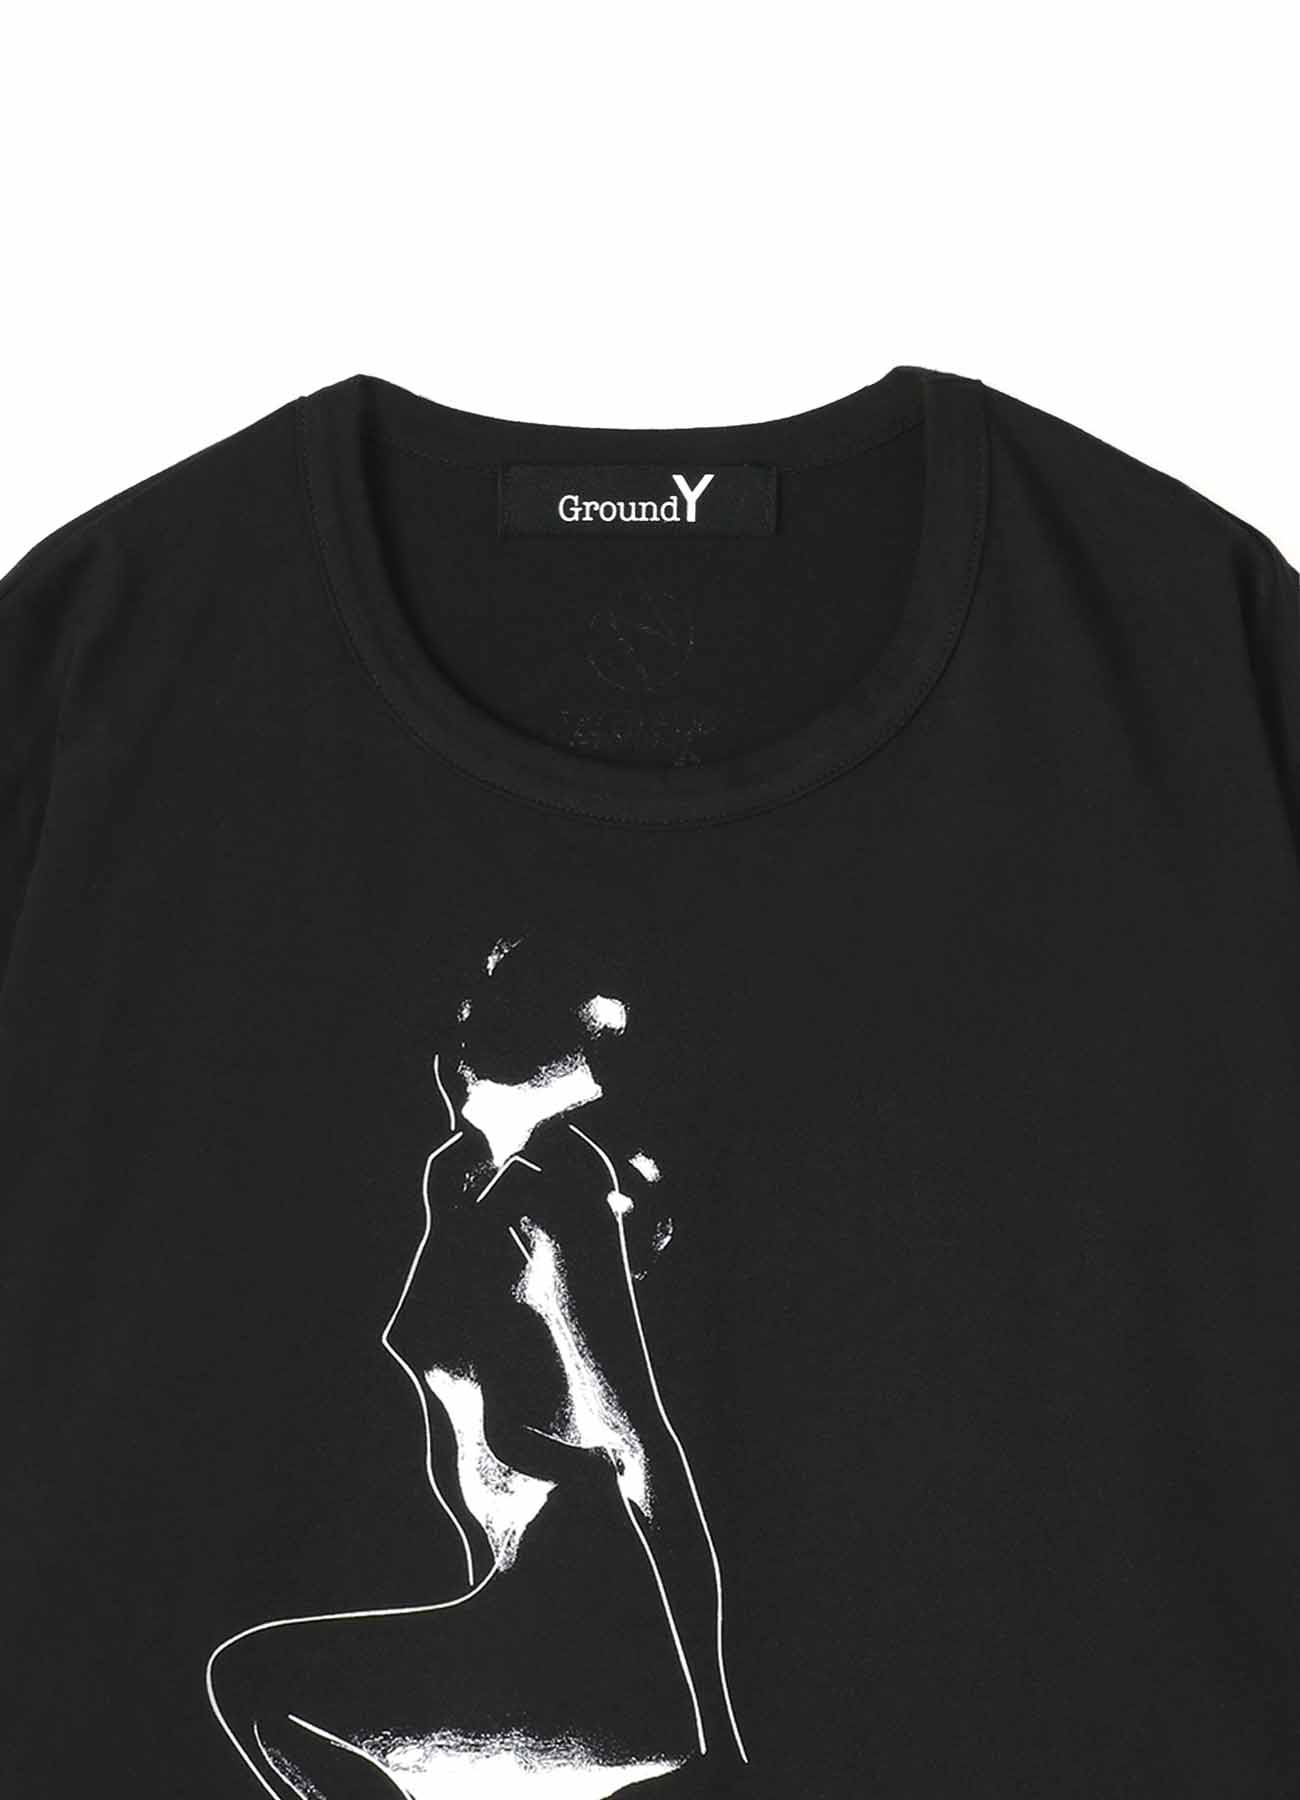 Ground Y×SCANDAL Collaboration 【RINA】Tshirt